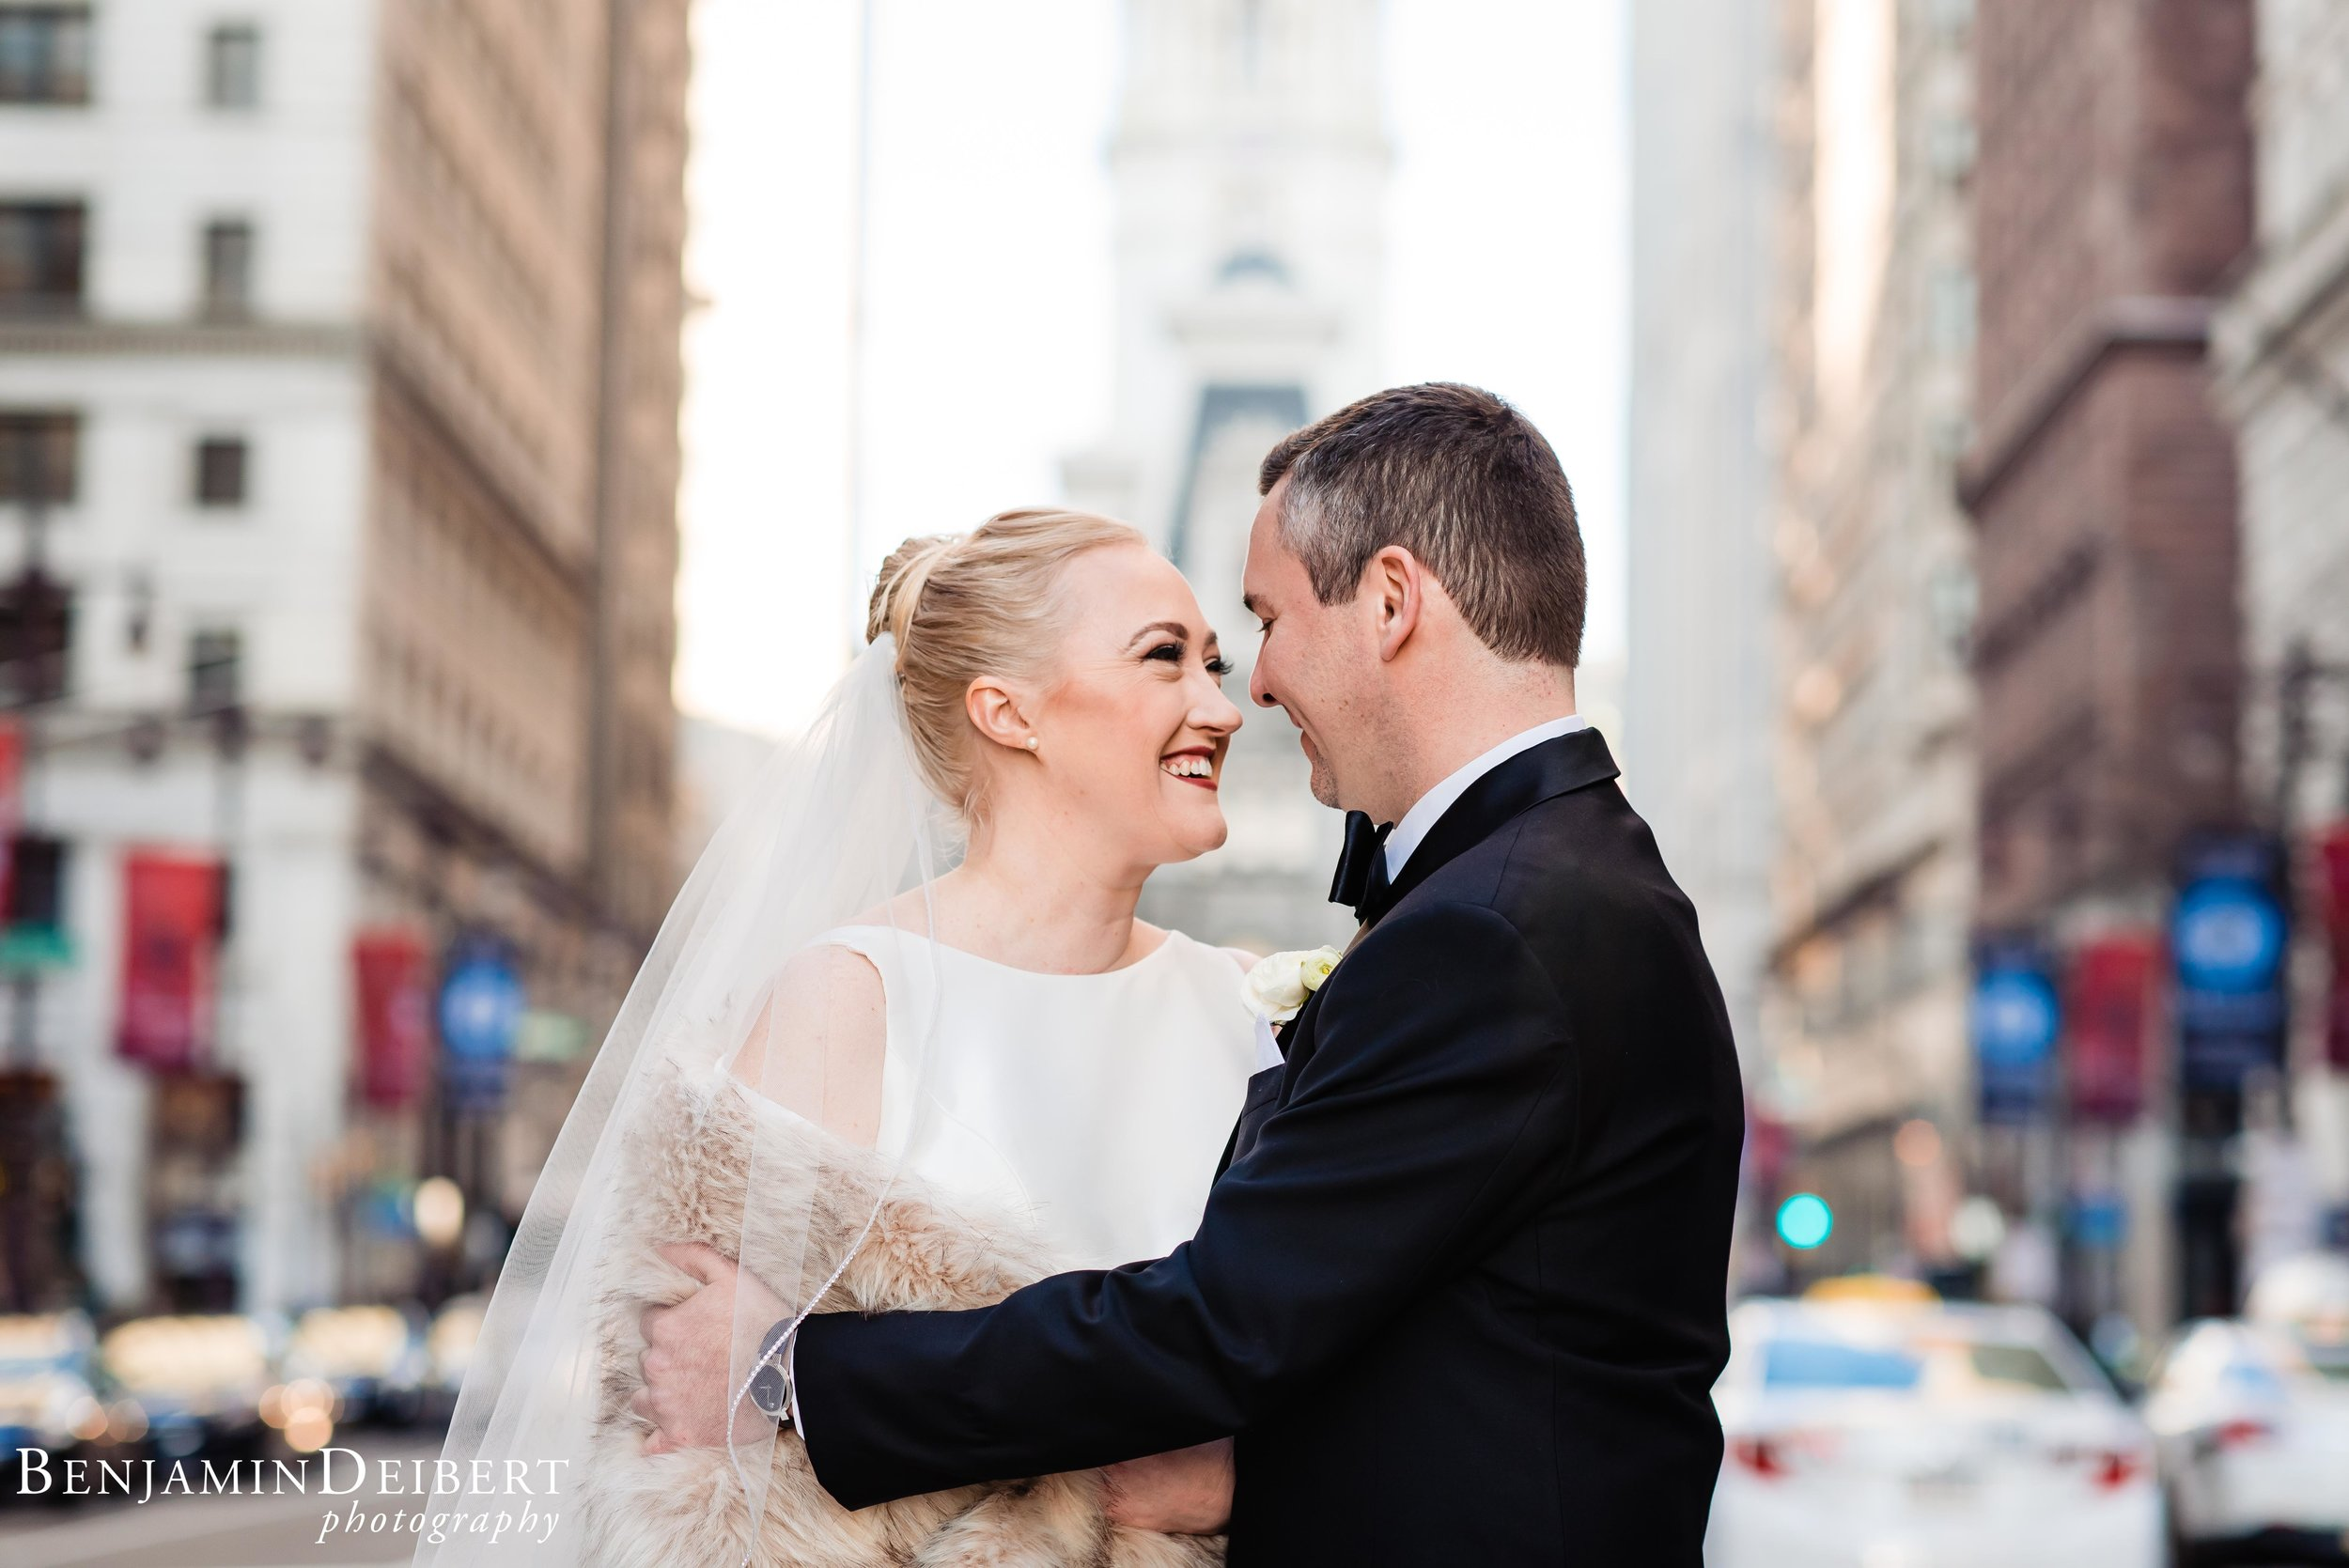 PatriceandAdam_TheLucy__Cescaphe_Wedding-21.jpg